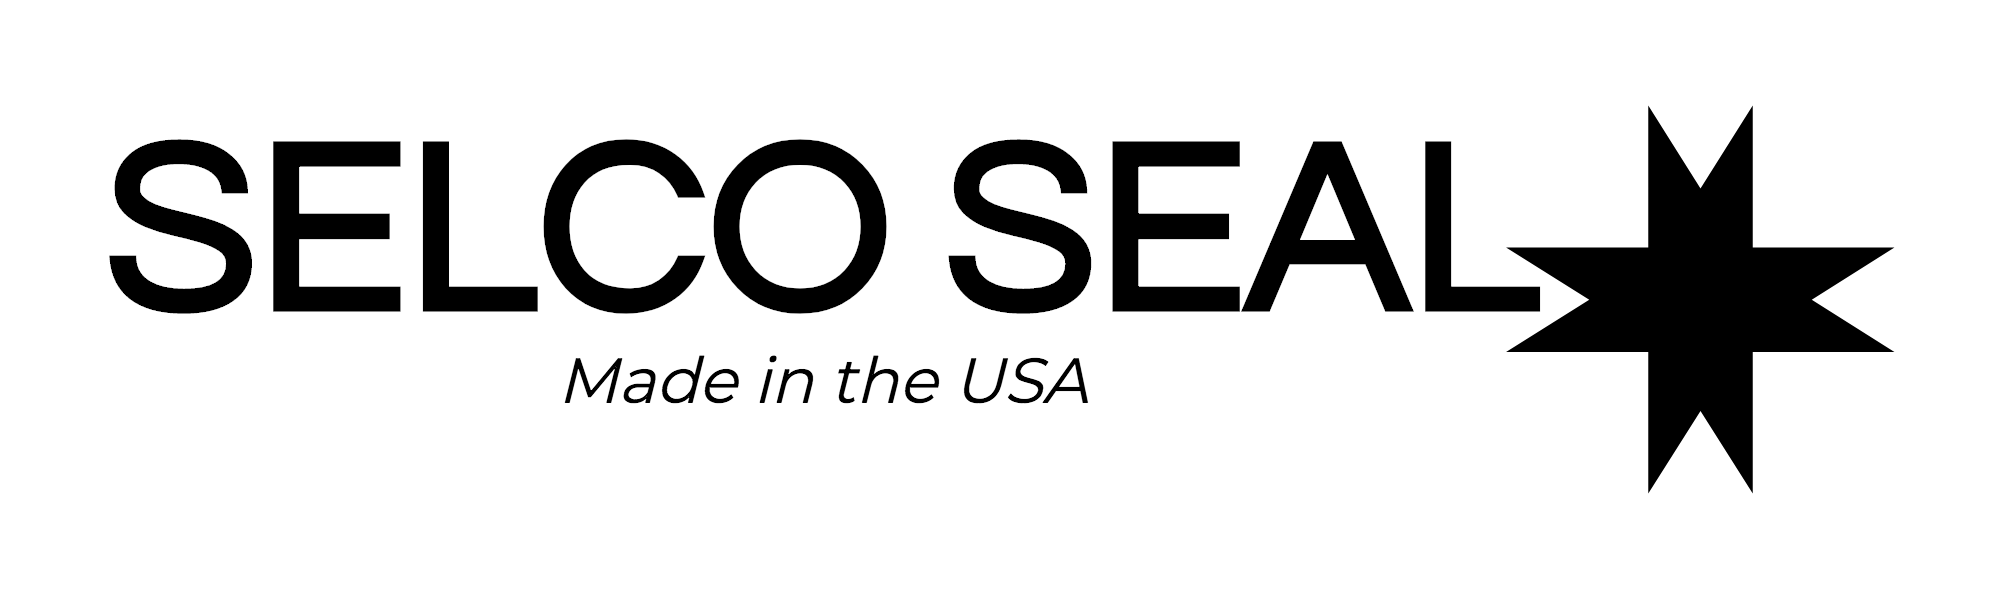 SELCO SEAL-logo-black.png